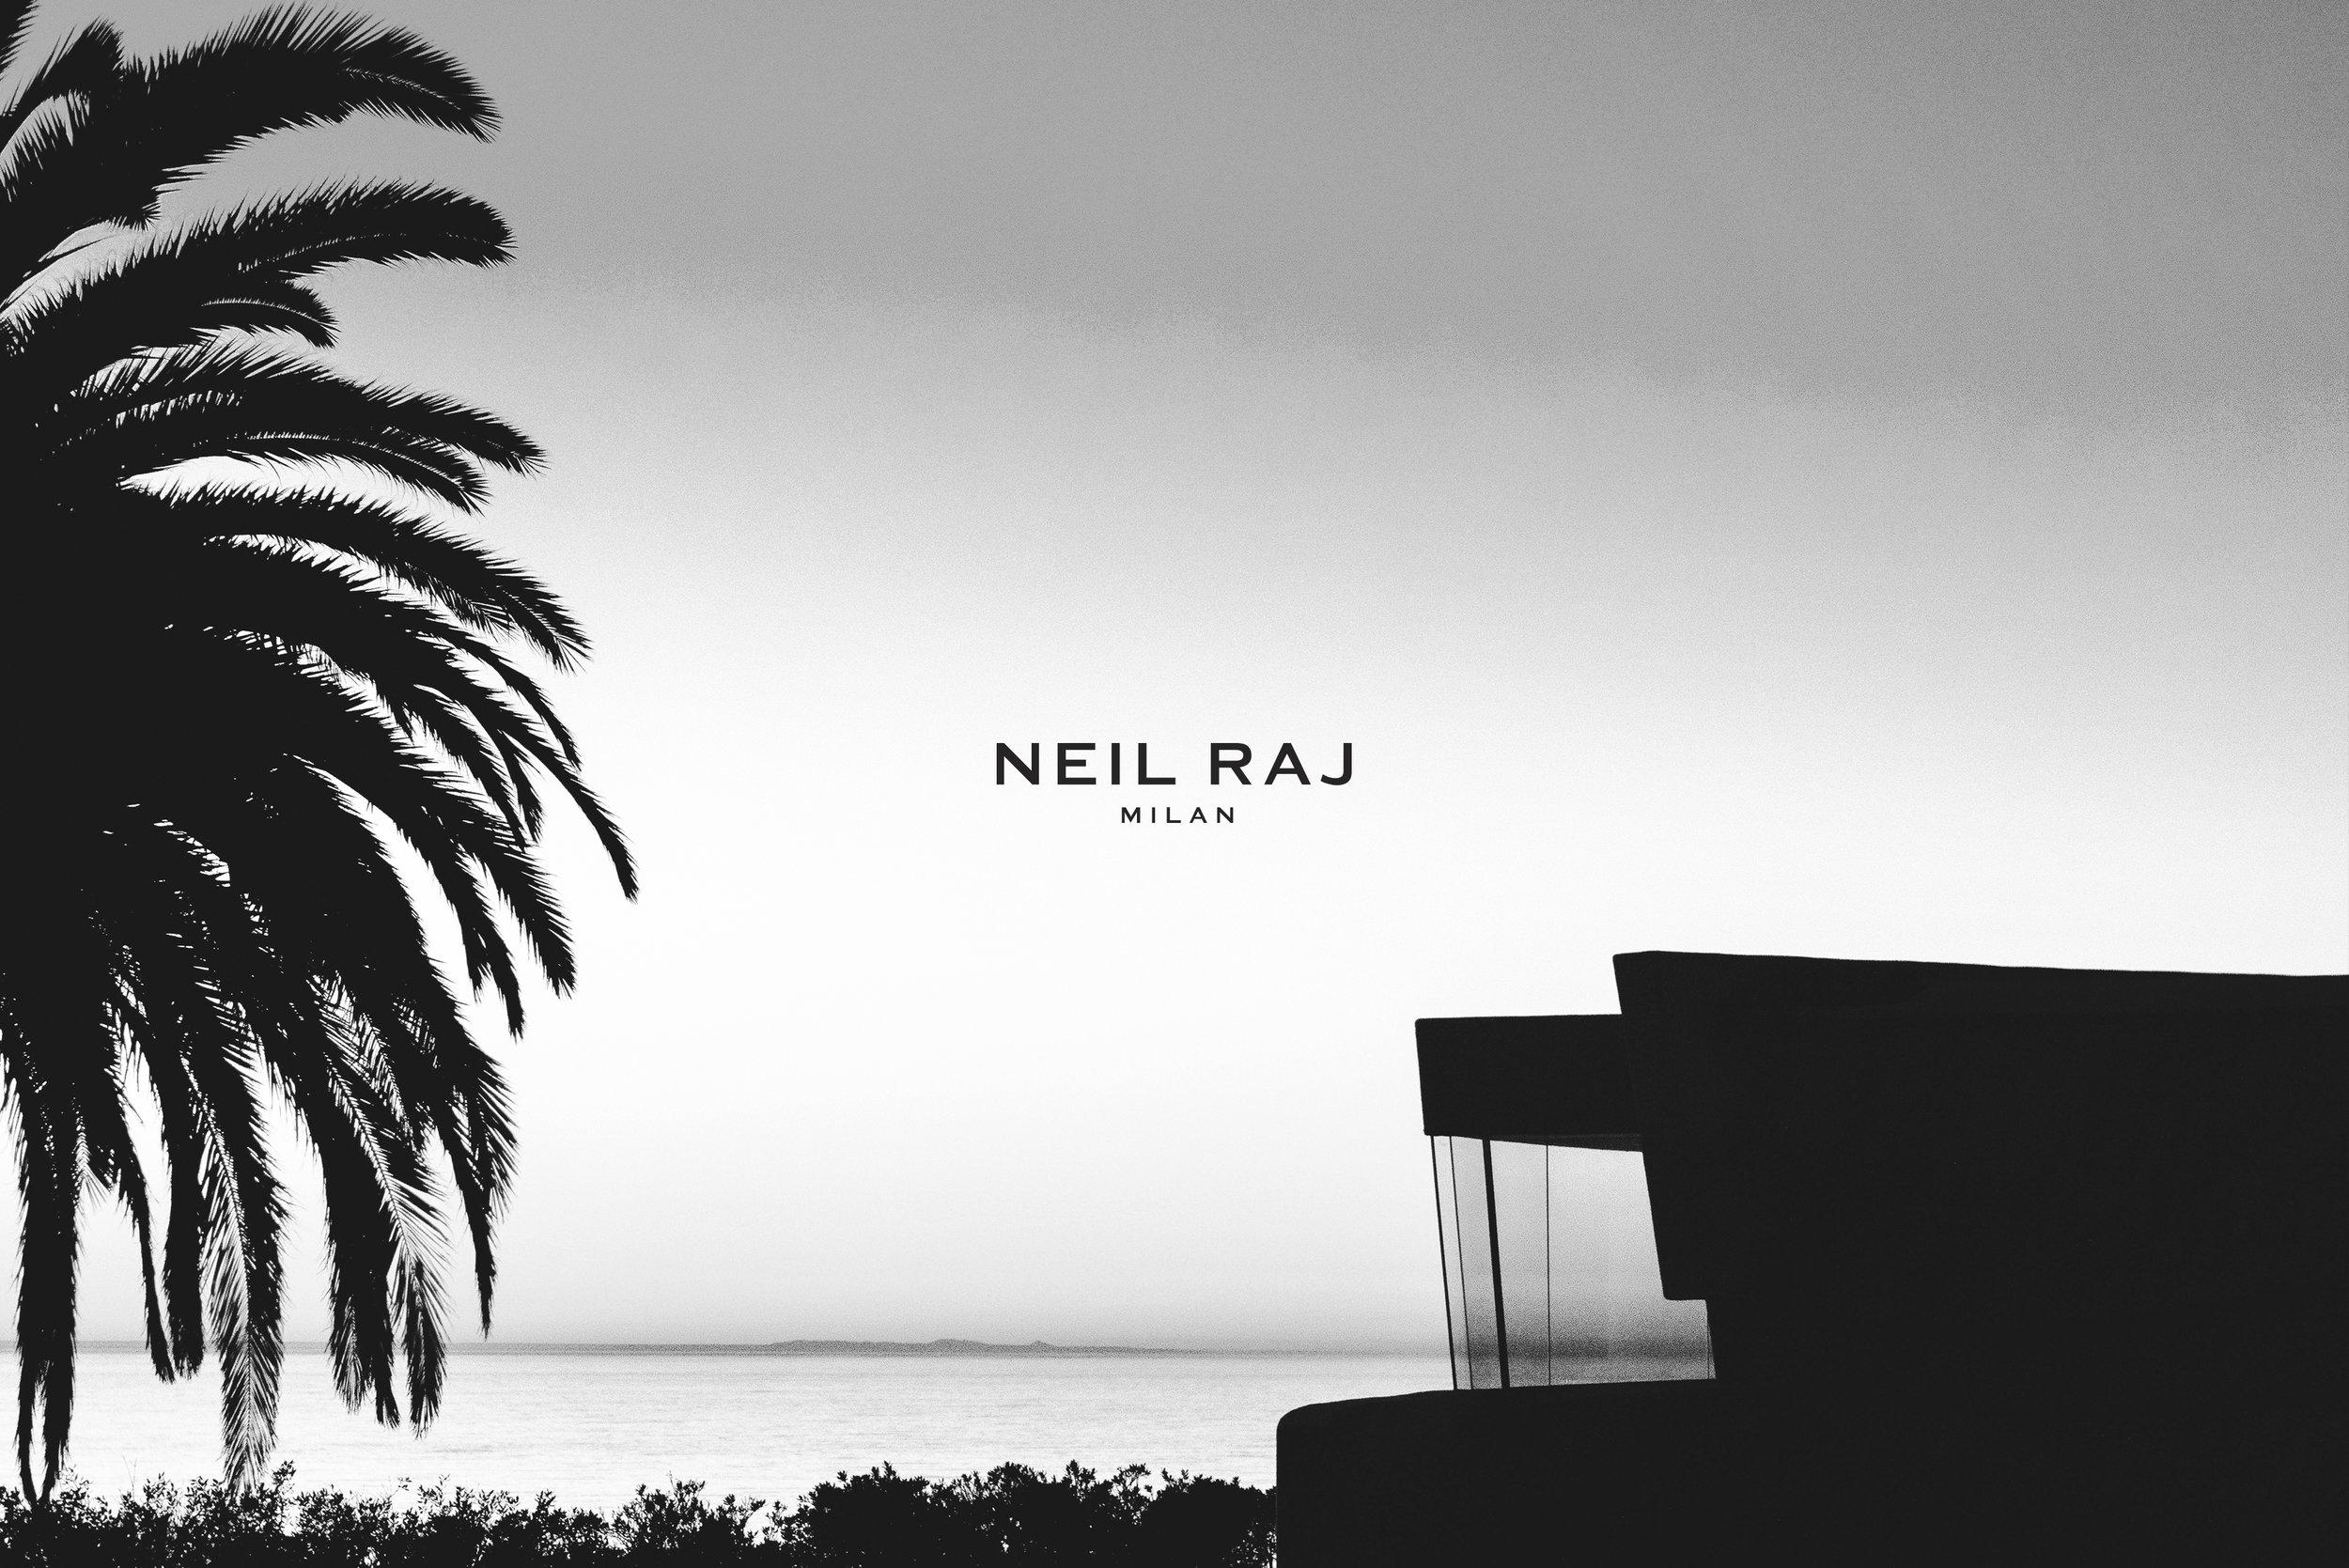 NR_COVER_FINAL2.jpg